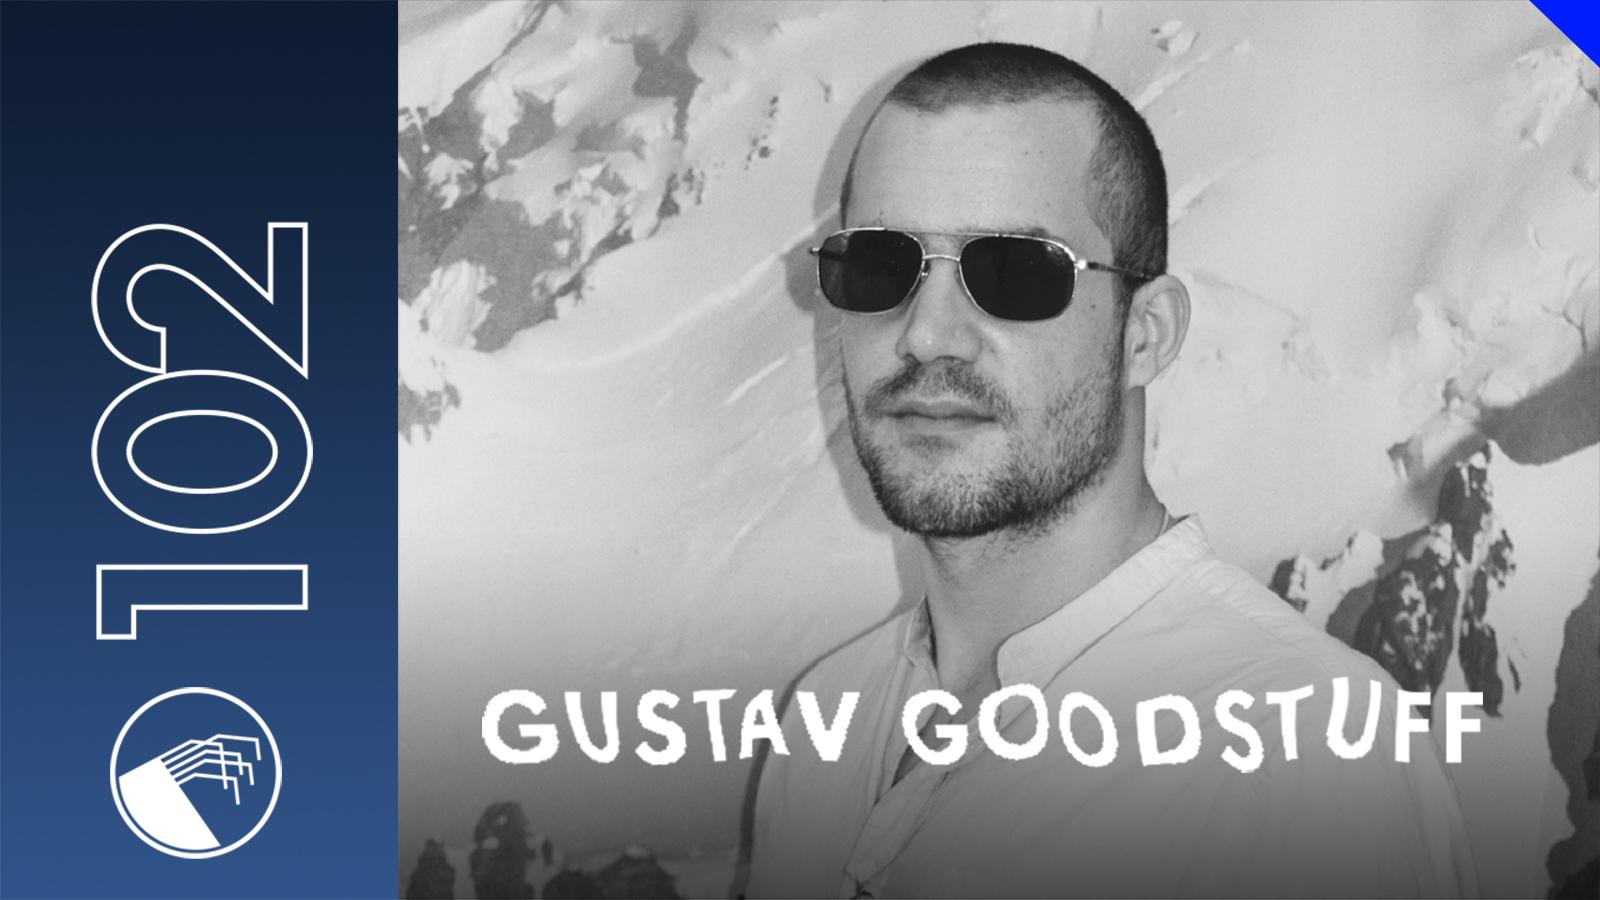 102 Gustav Goodstuff